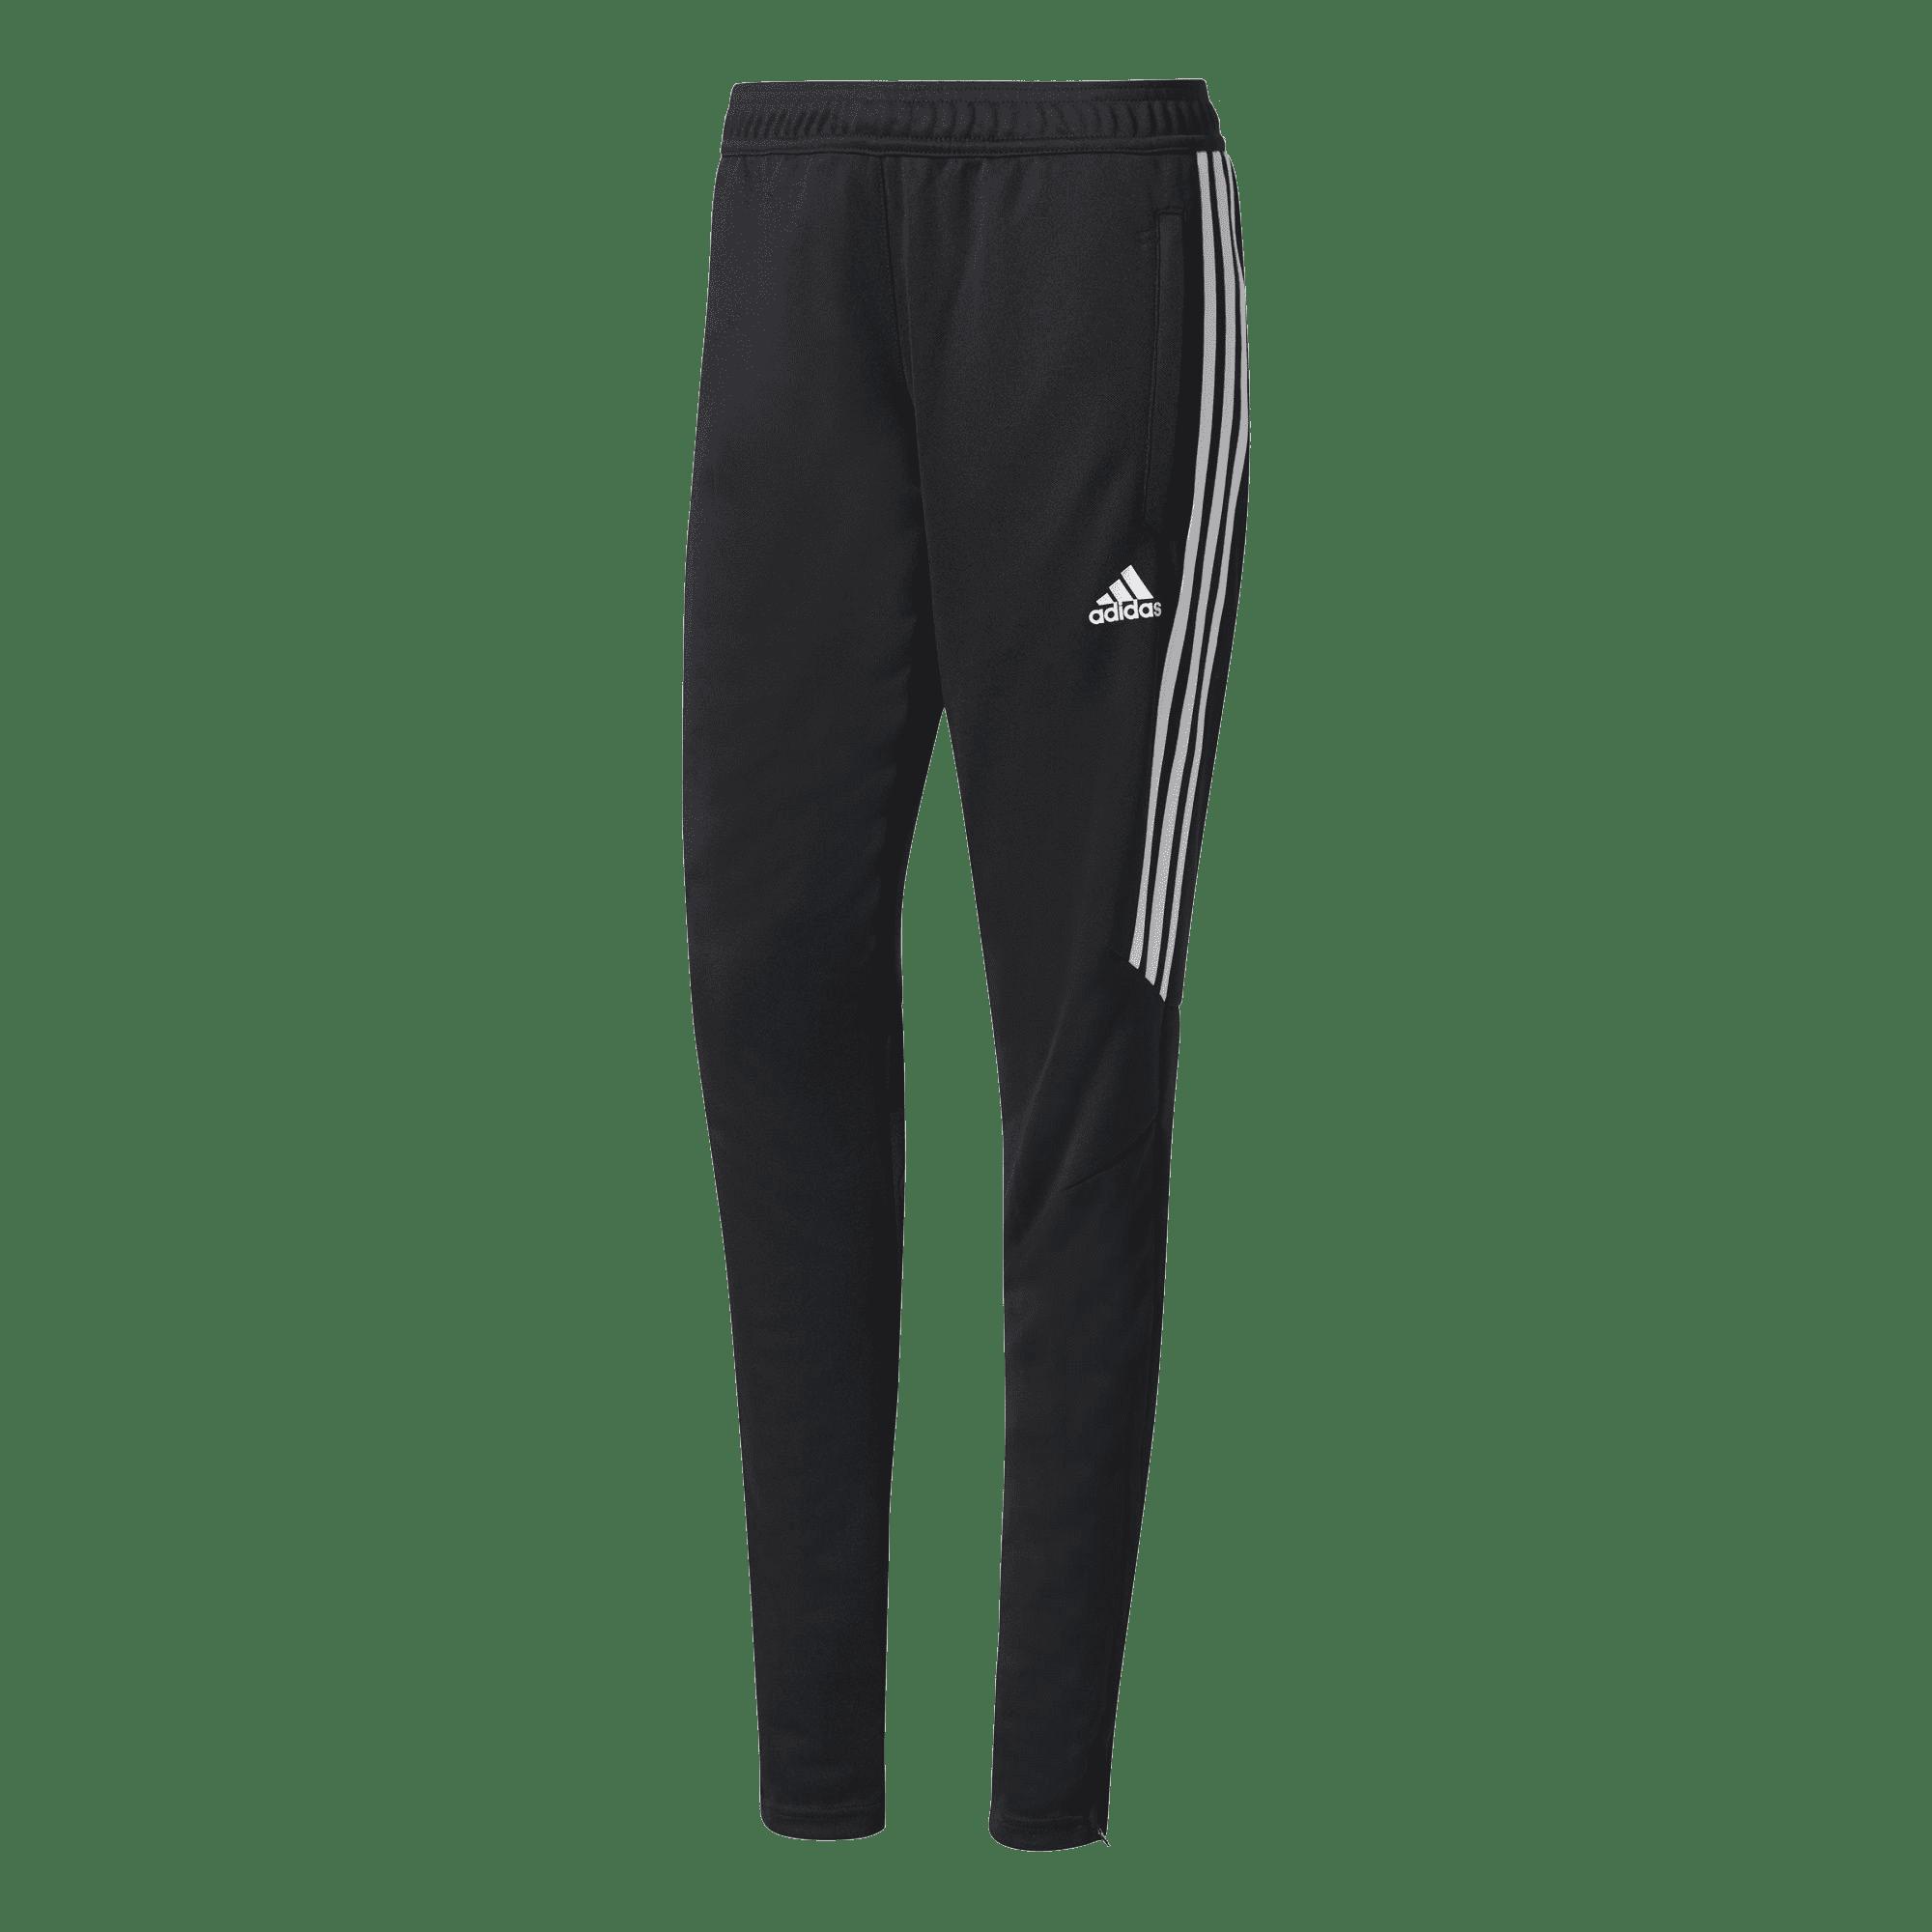 Soccer Tiro 17 Training Pants - Walmart